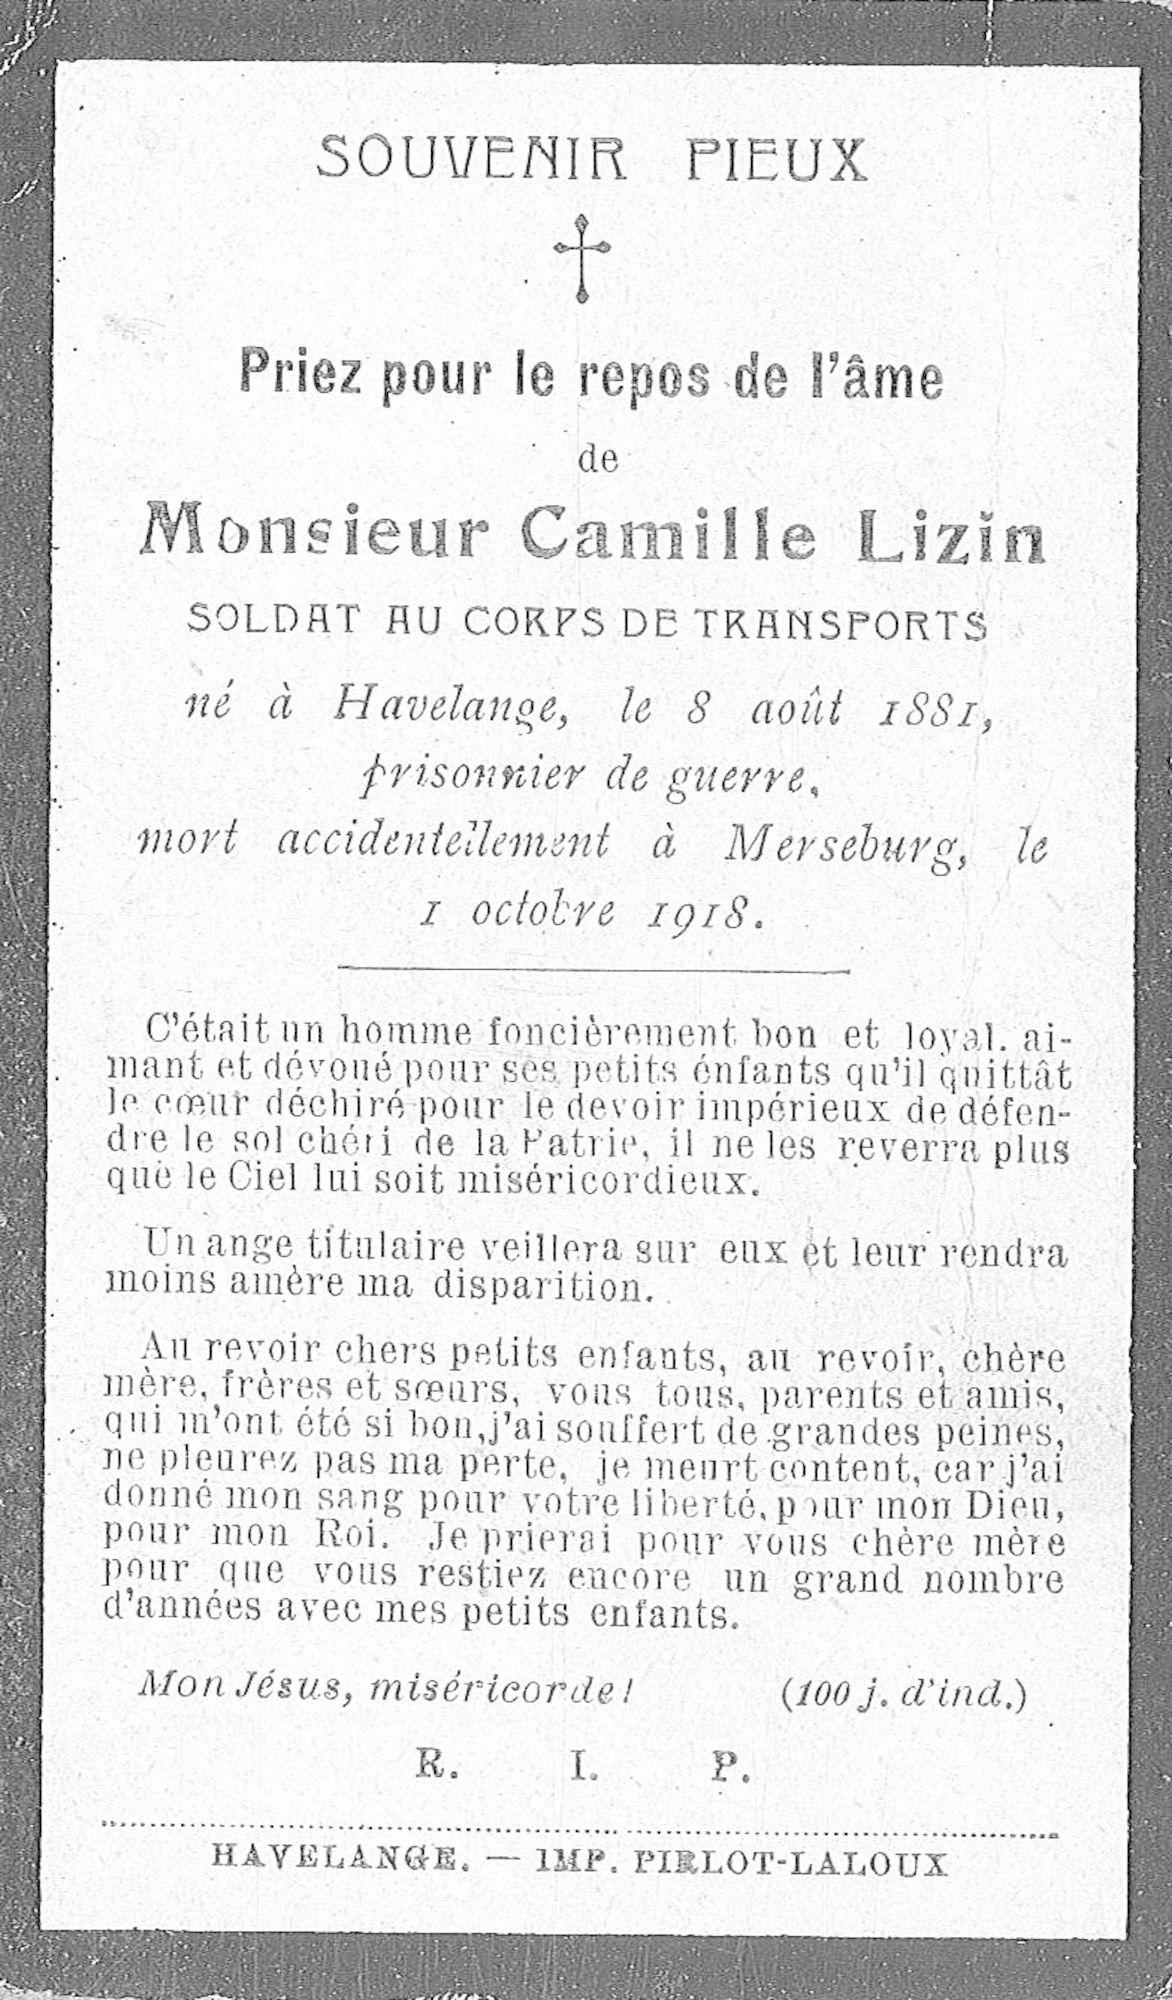 Camille Lizin